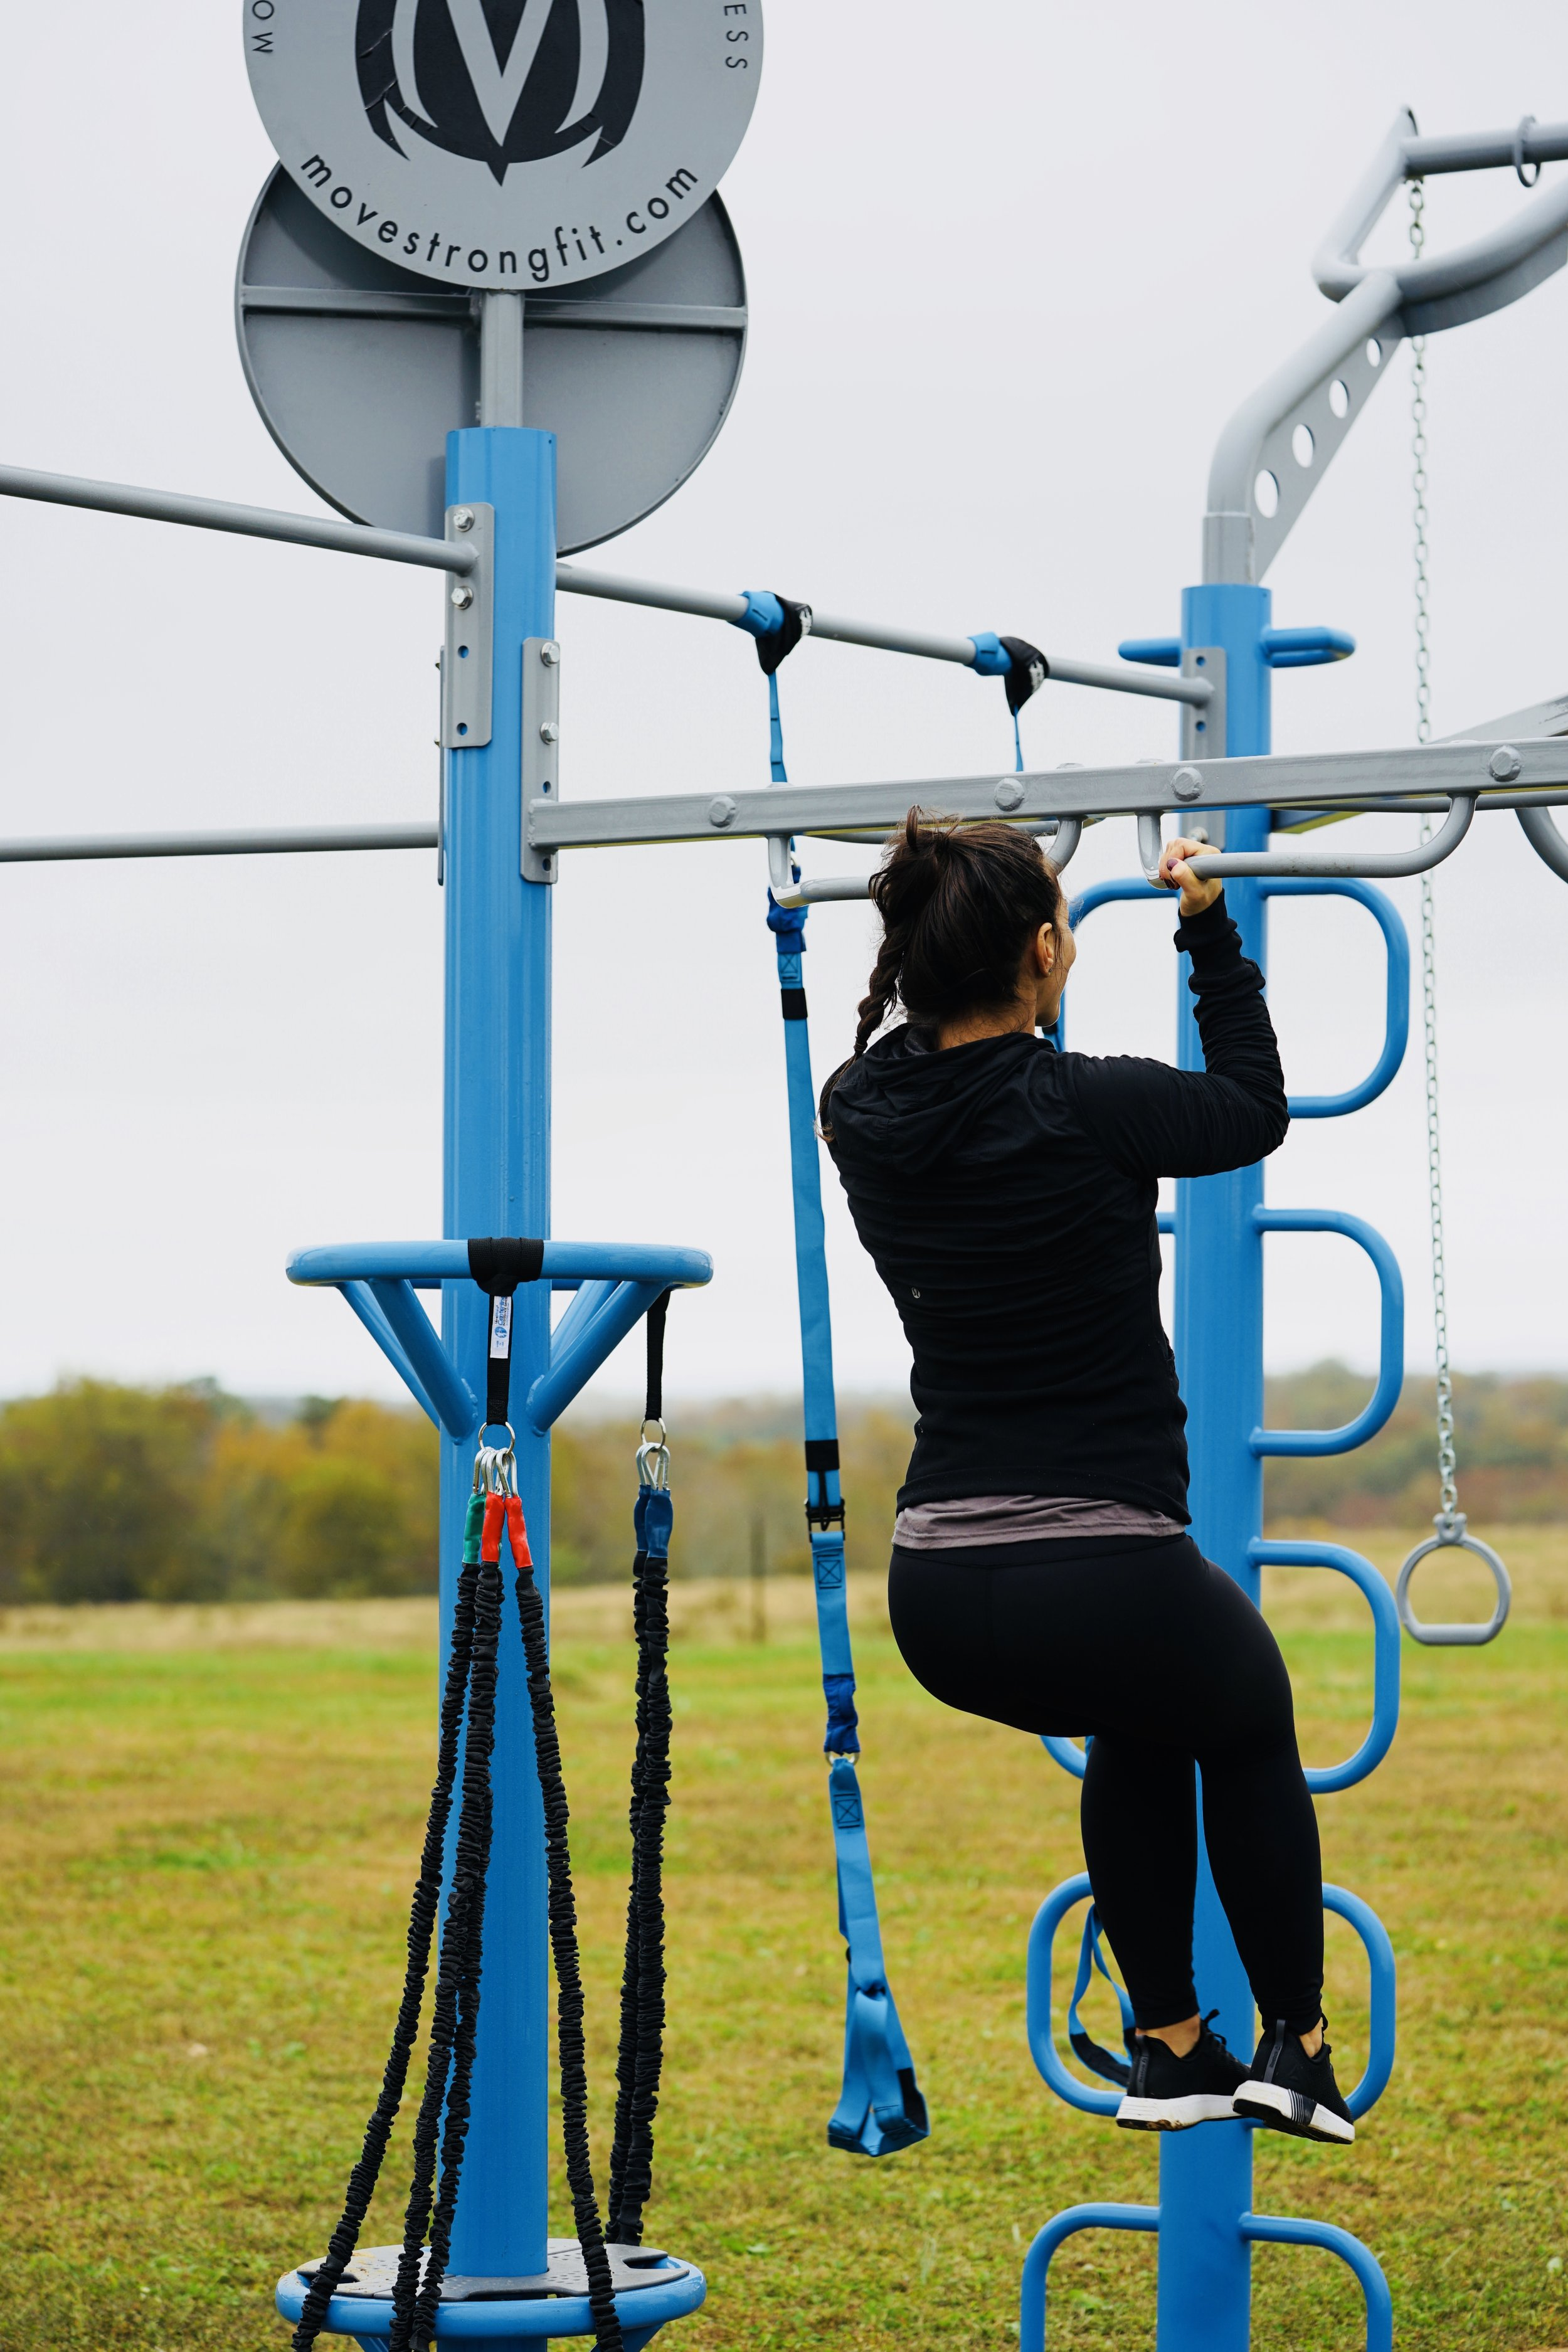 Outdoor fitness equipment pull-ups